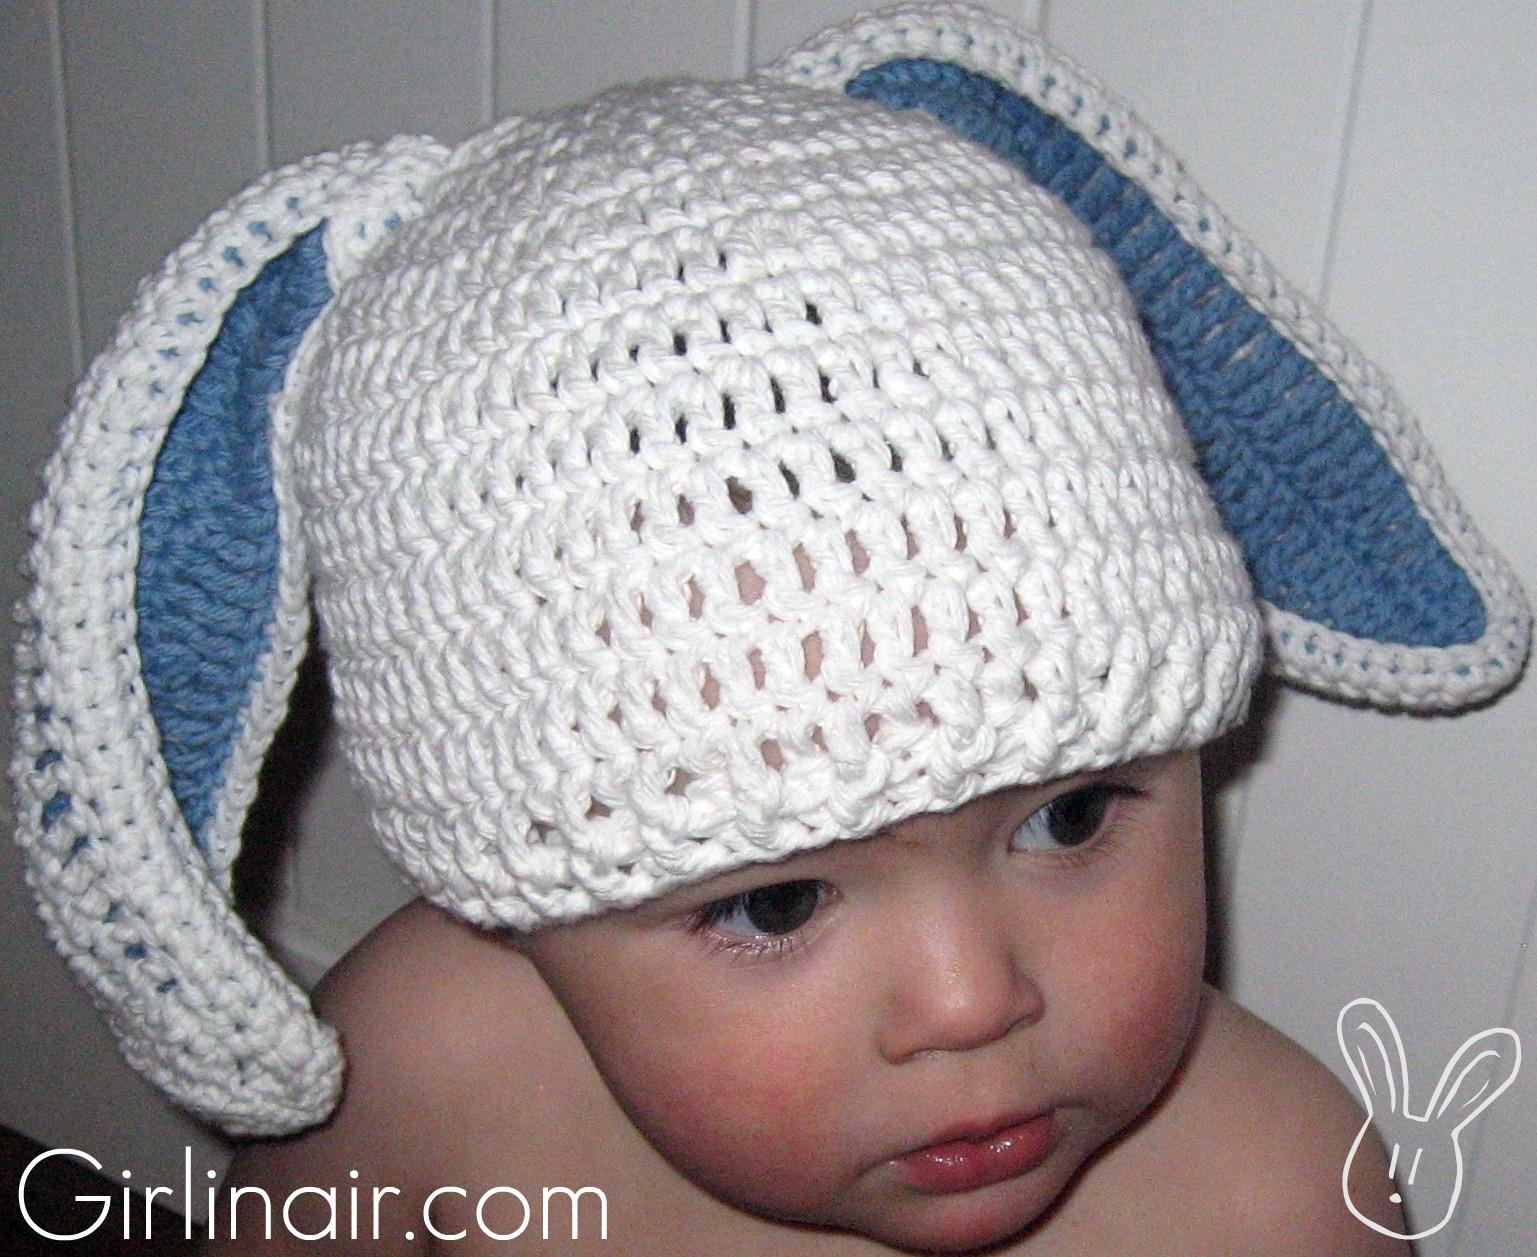 Girl in Air BLOG  Floppy Bunny Hat Pattern 1ccf138cb75f